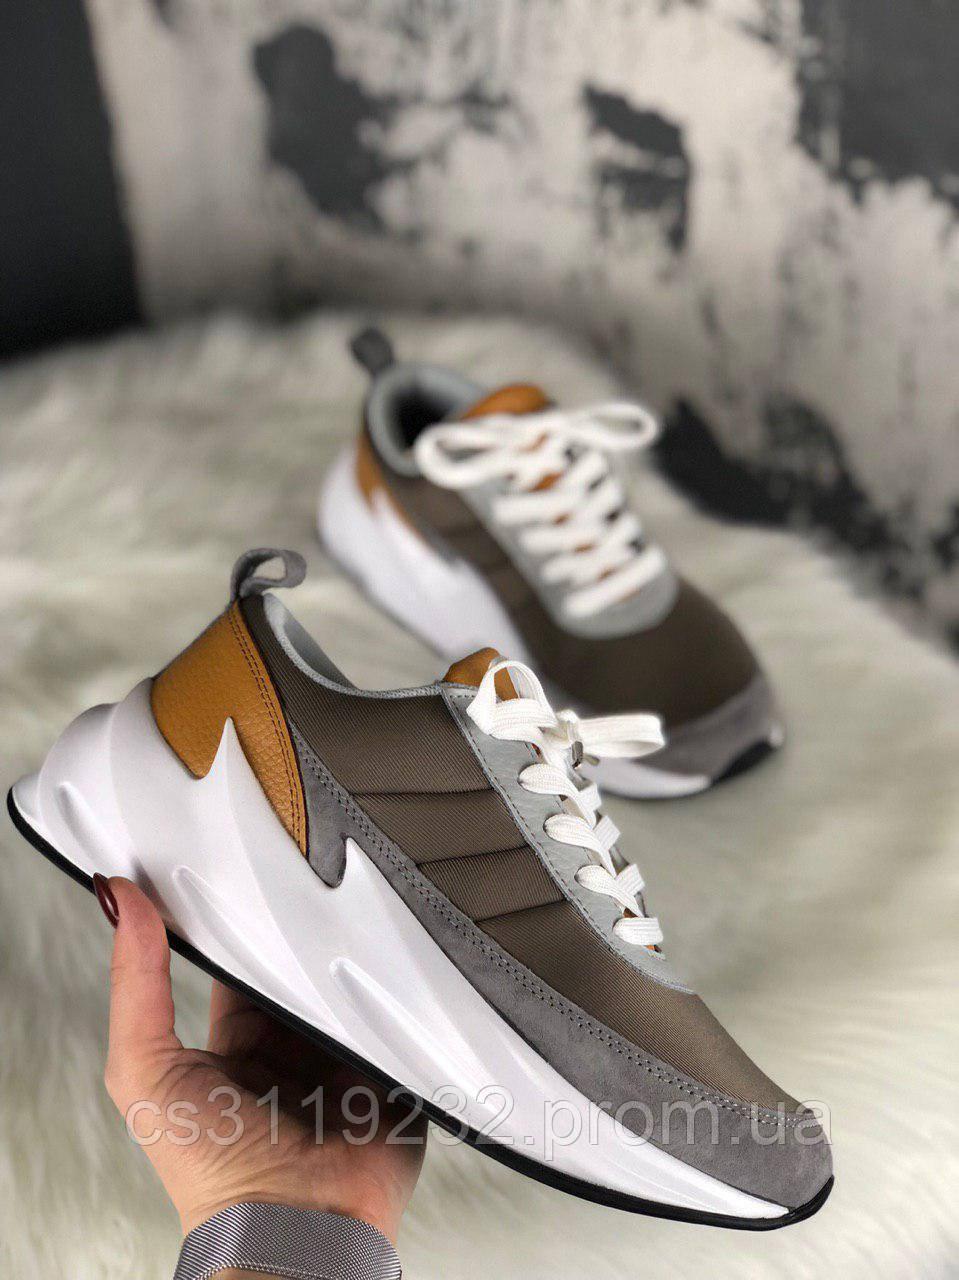 Женские кроссовки Adidas Sharks Brown Grey White (коричневый/серый/белый)